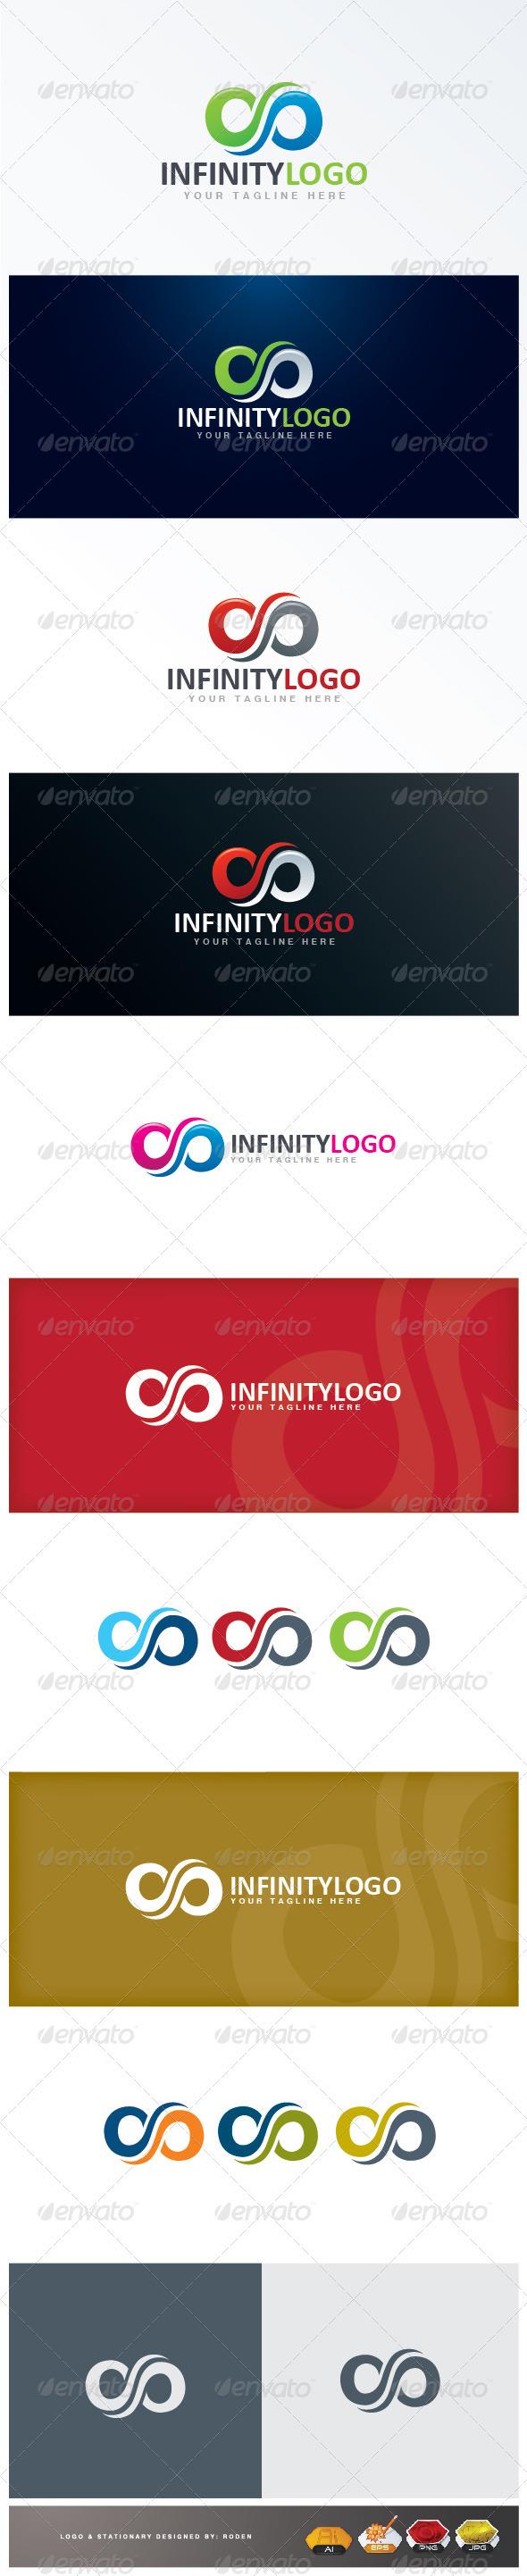 GraphicRiver Infinity logo 3344154